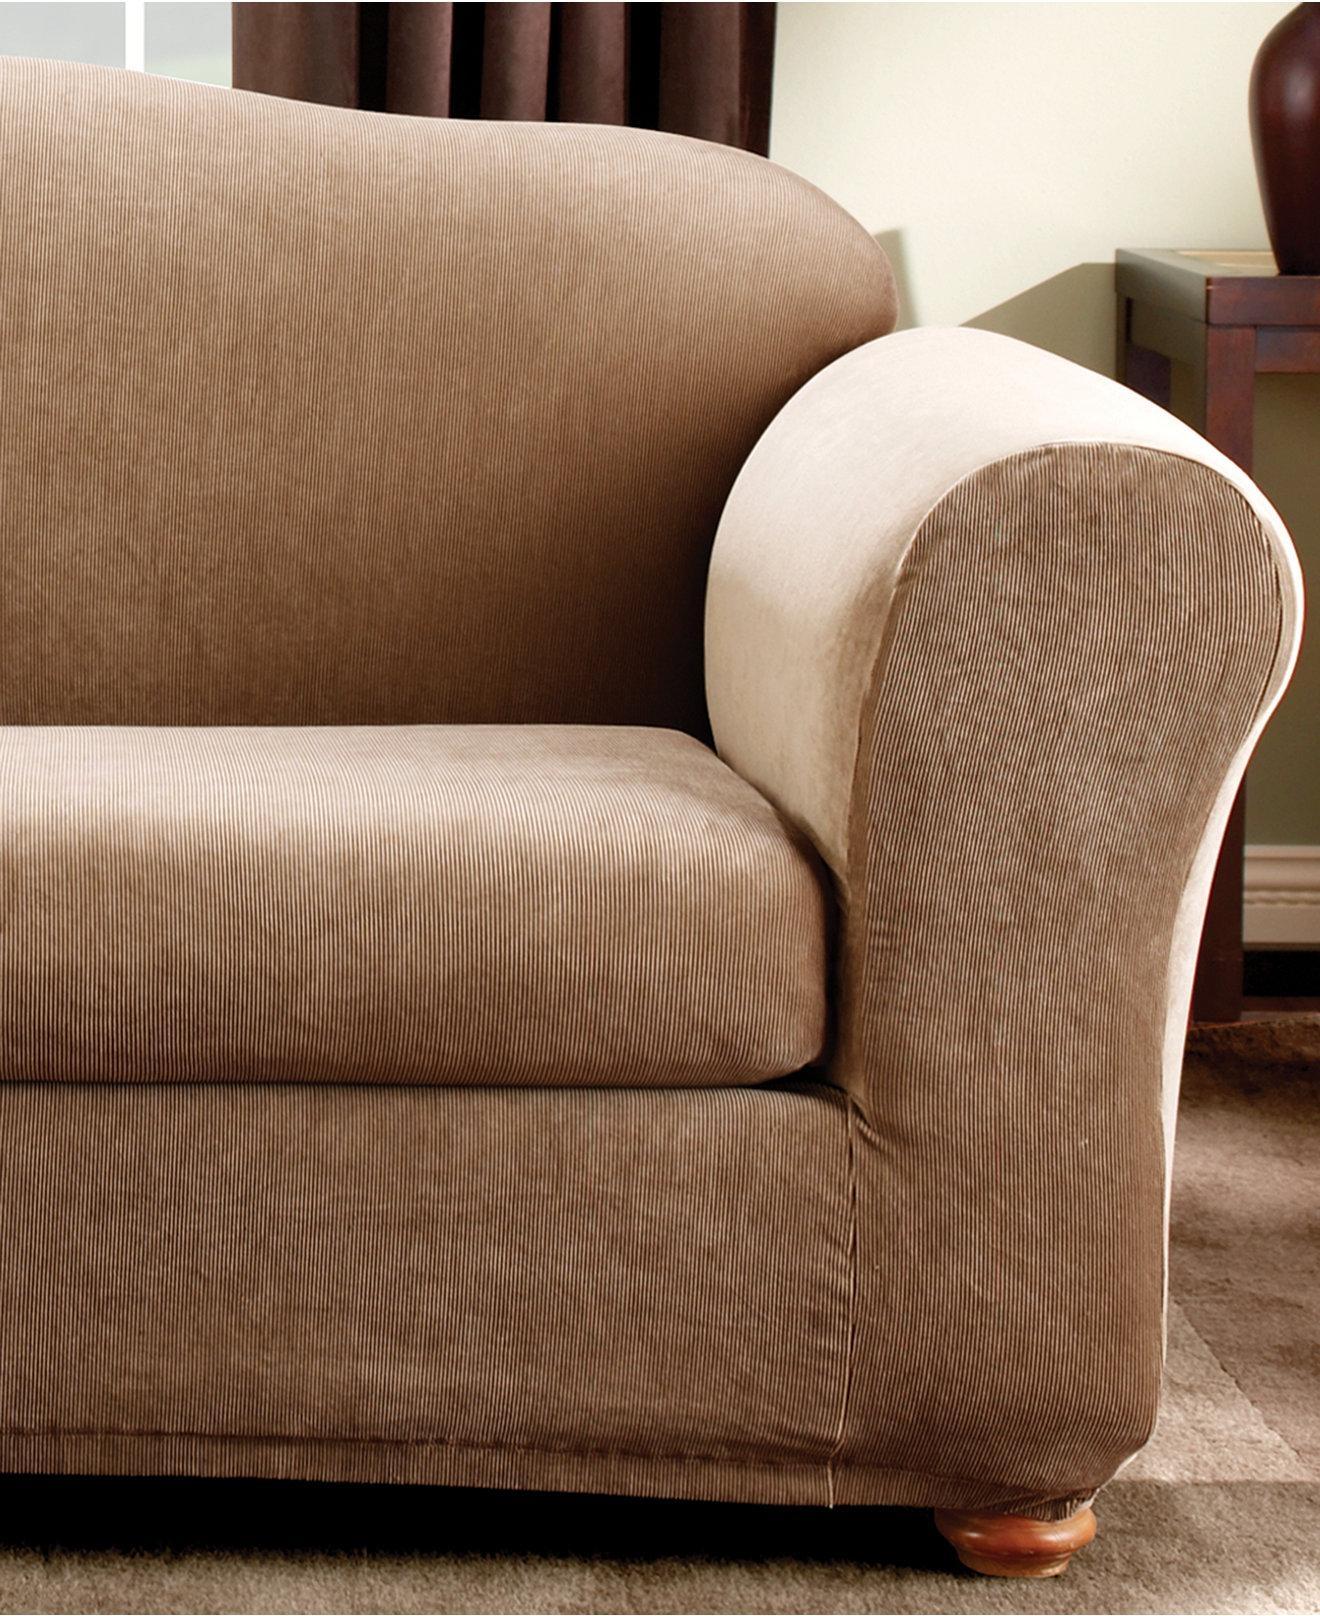 3 Piece Sofa Slipcover | Ira Design Pertaining To 3 Piece Sofa Slipcovers (Image 1 of 20)